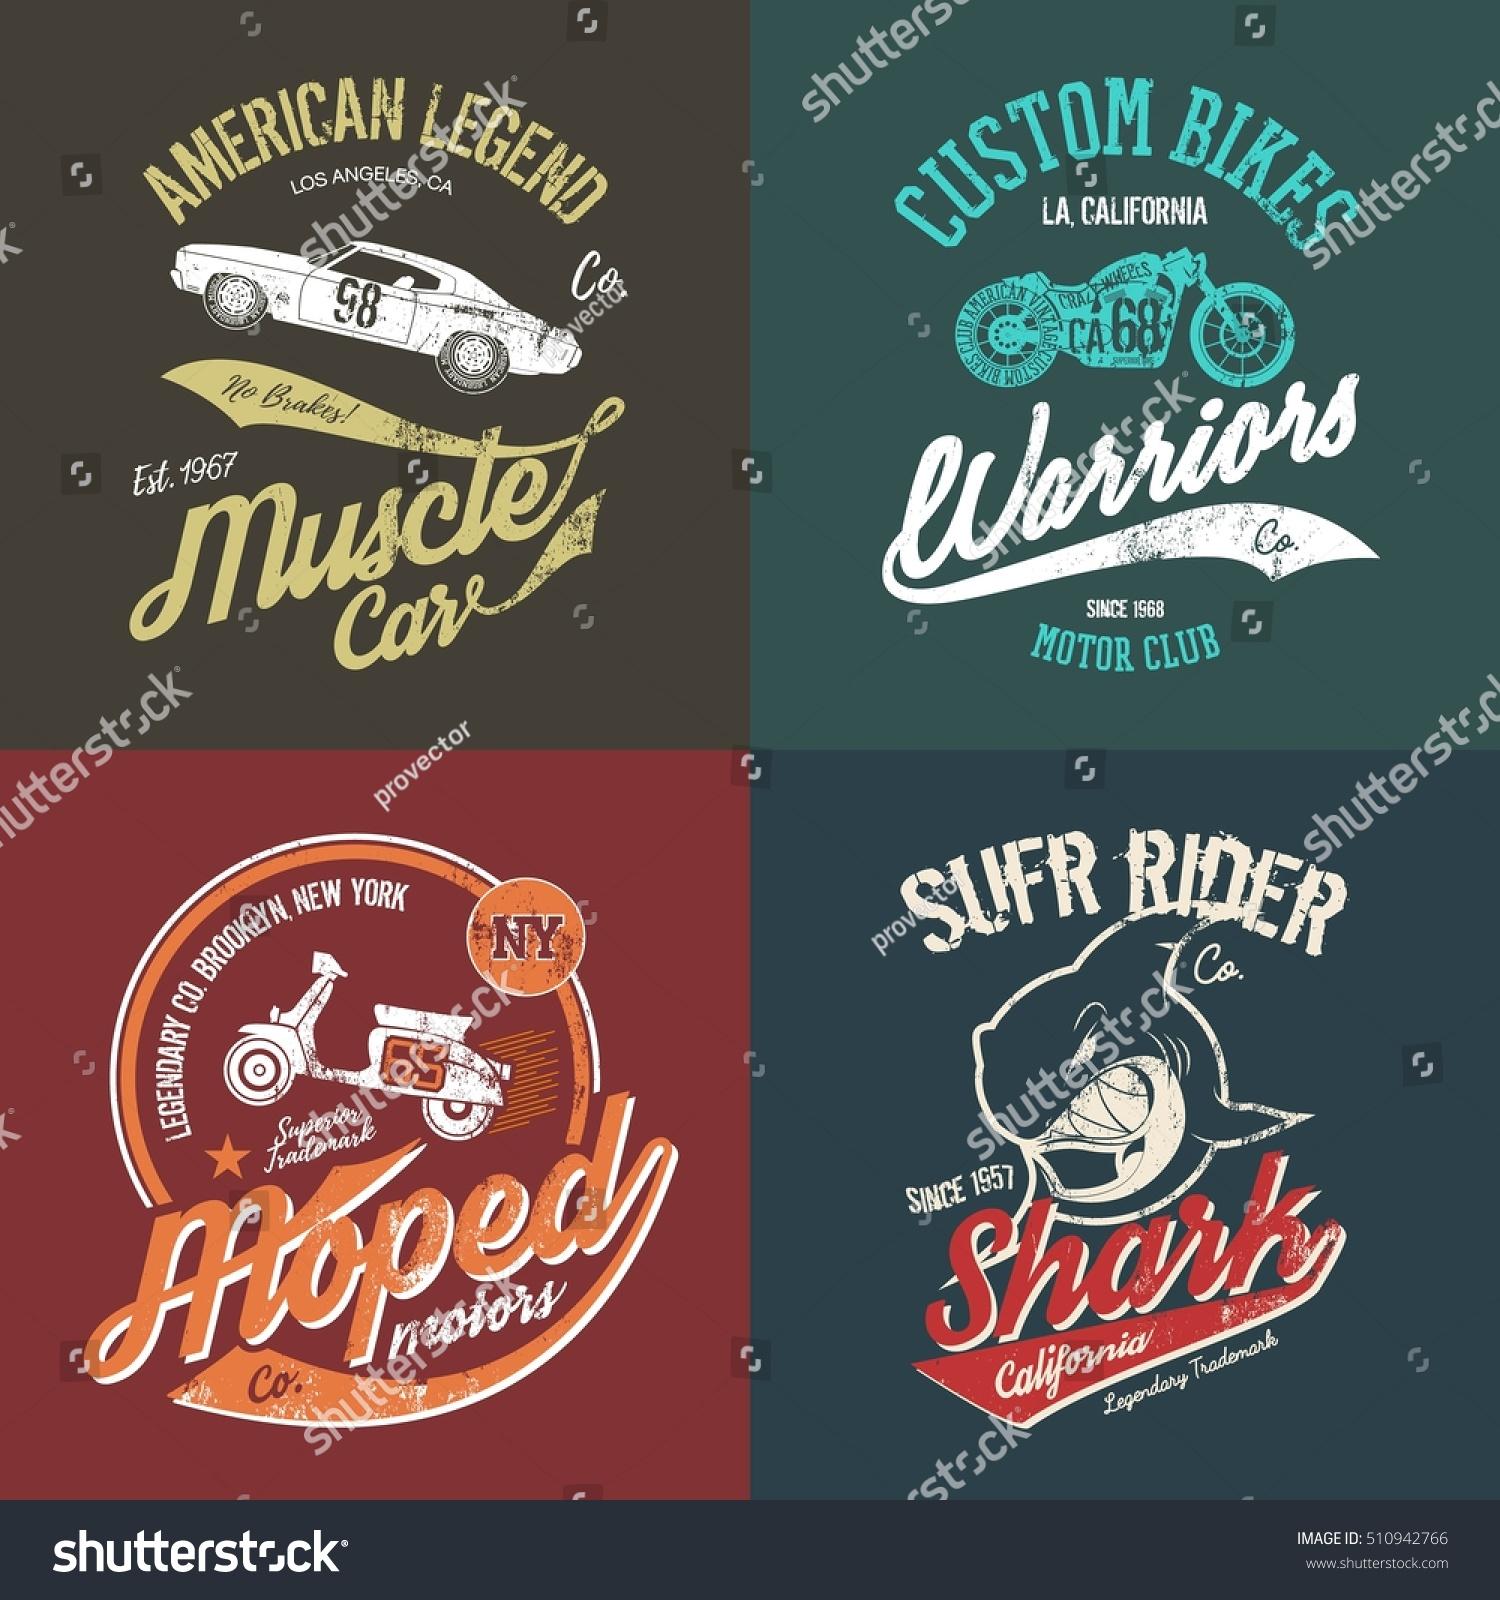 Vintage american muscle car custom motorcycle stock vector for Custom car club shirts